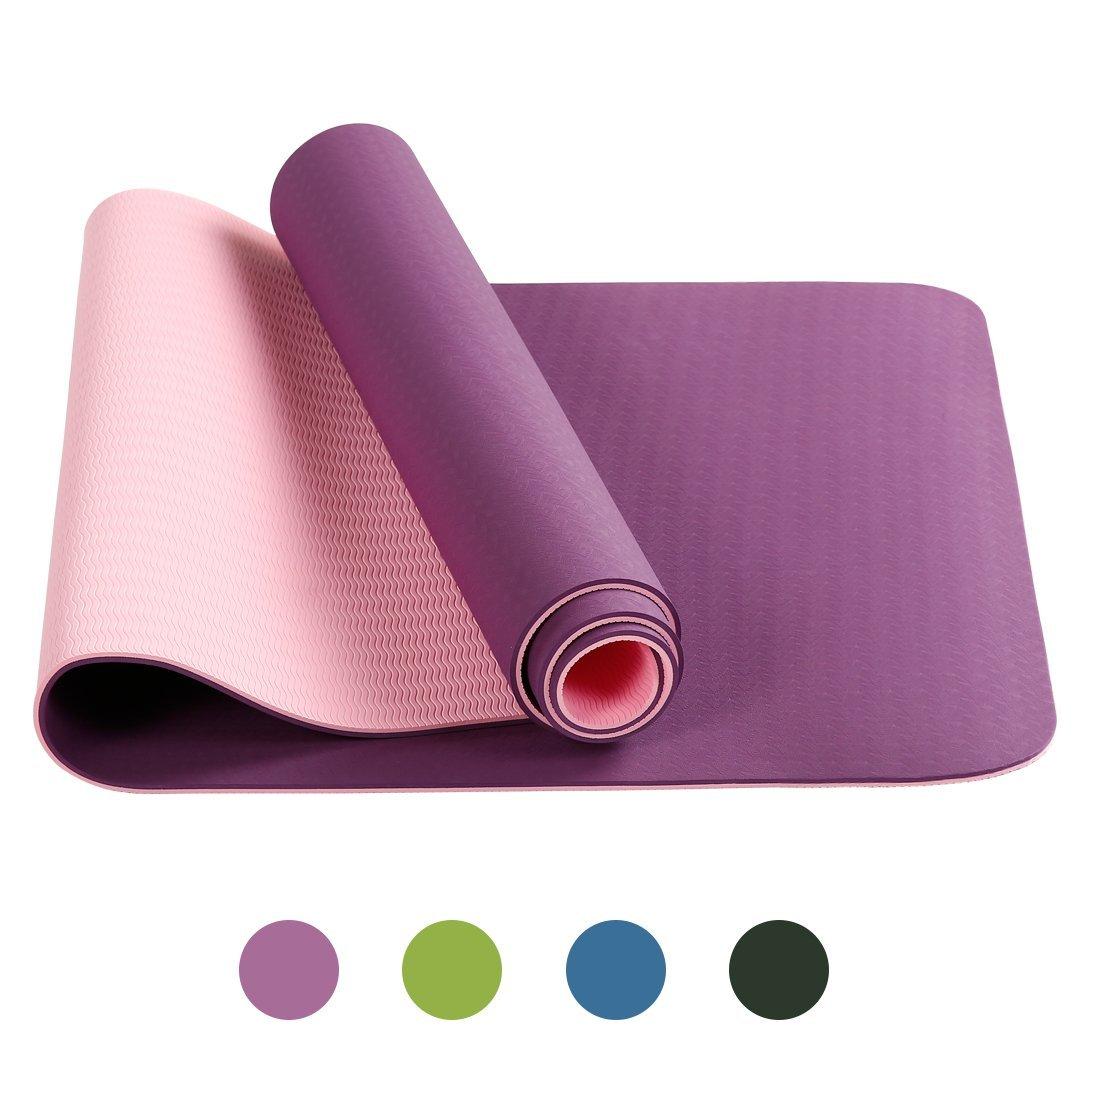 TPE 6mm Anti-Tear Yoga Mat by BLC starting at $16.14 + Free Shipping